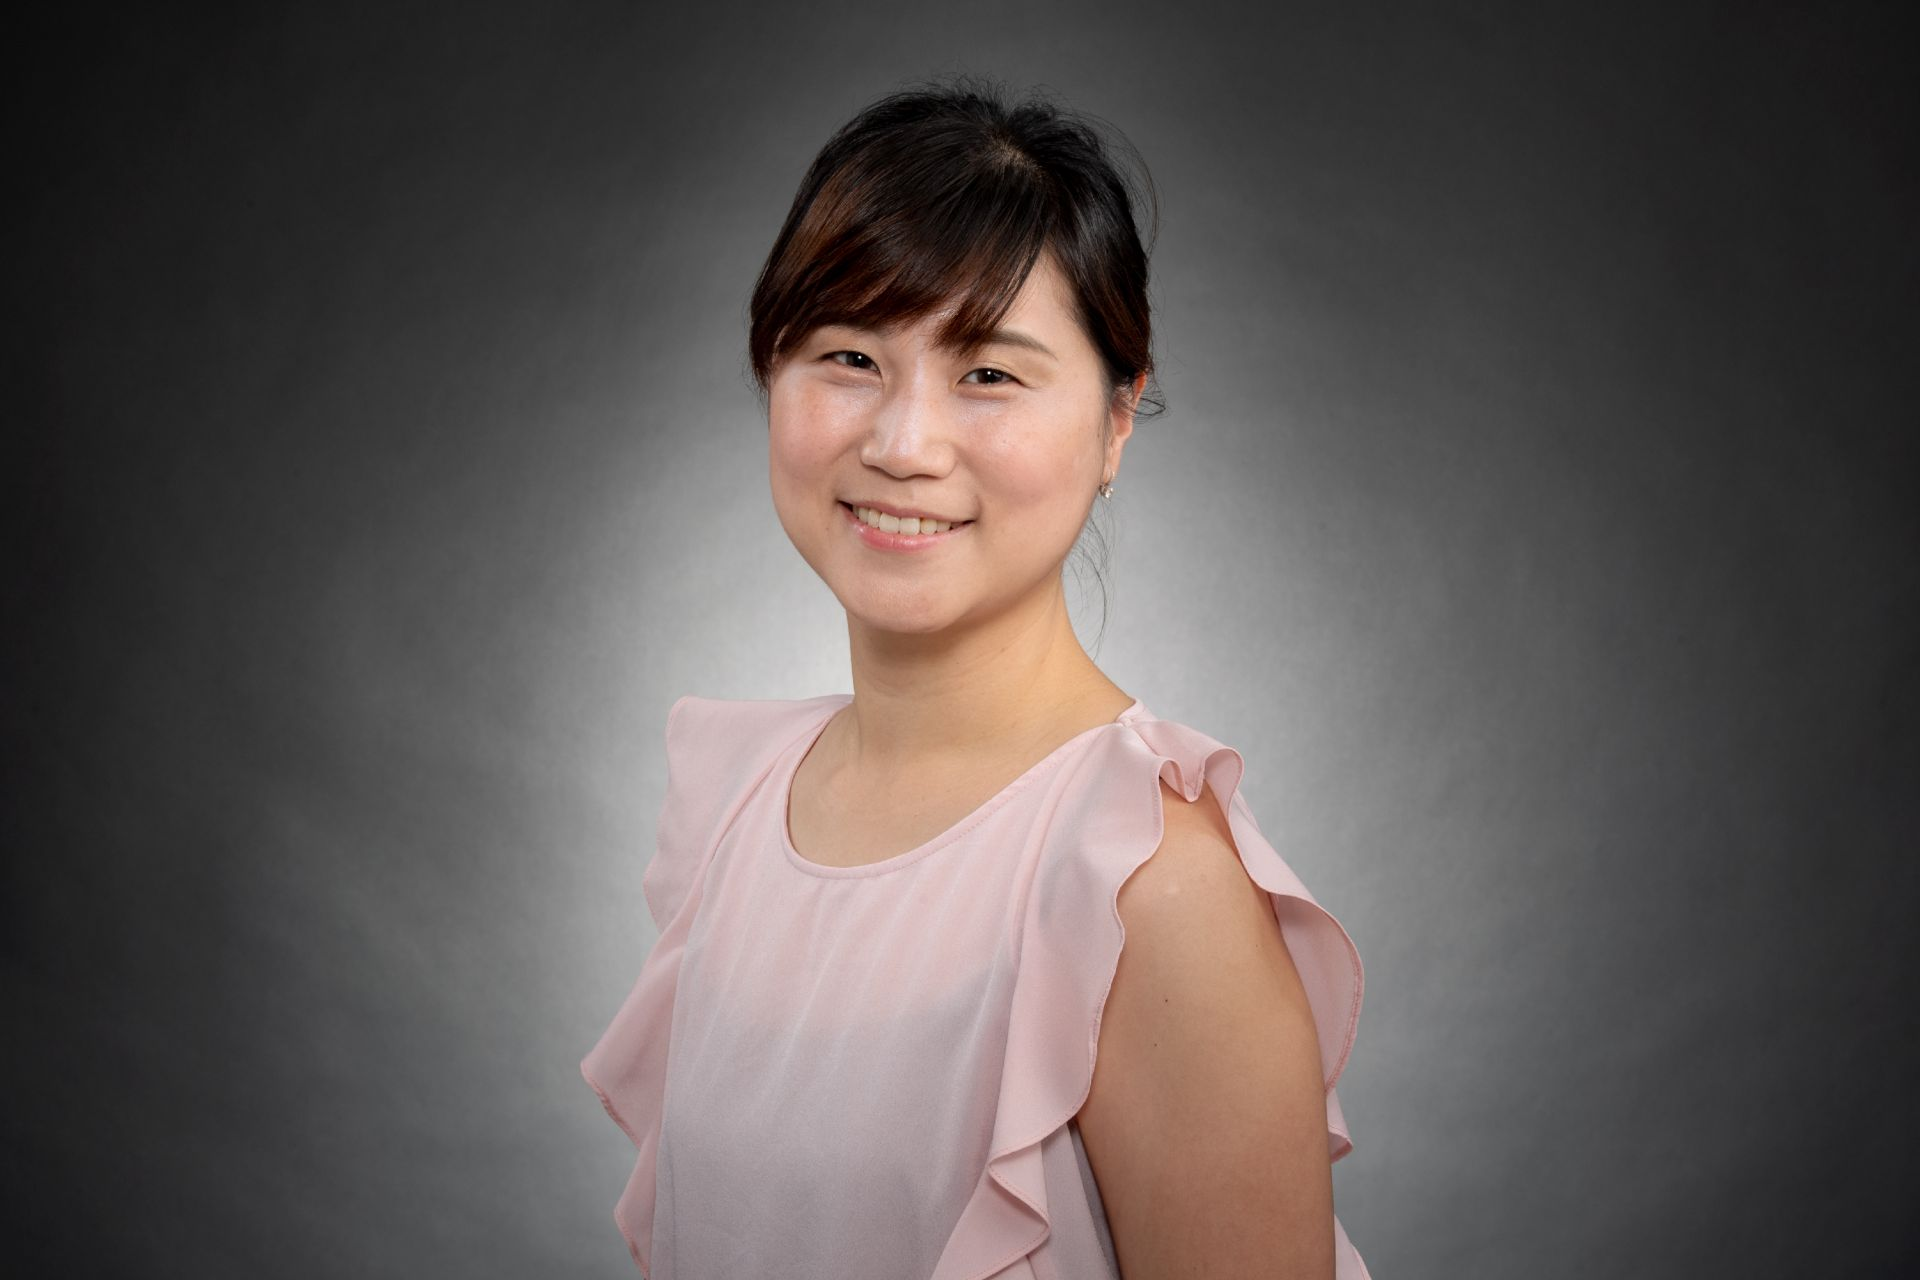 Yunjung Kim, PhD